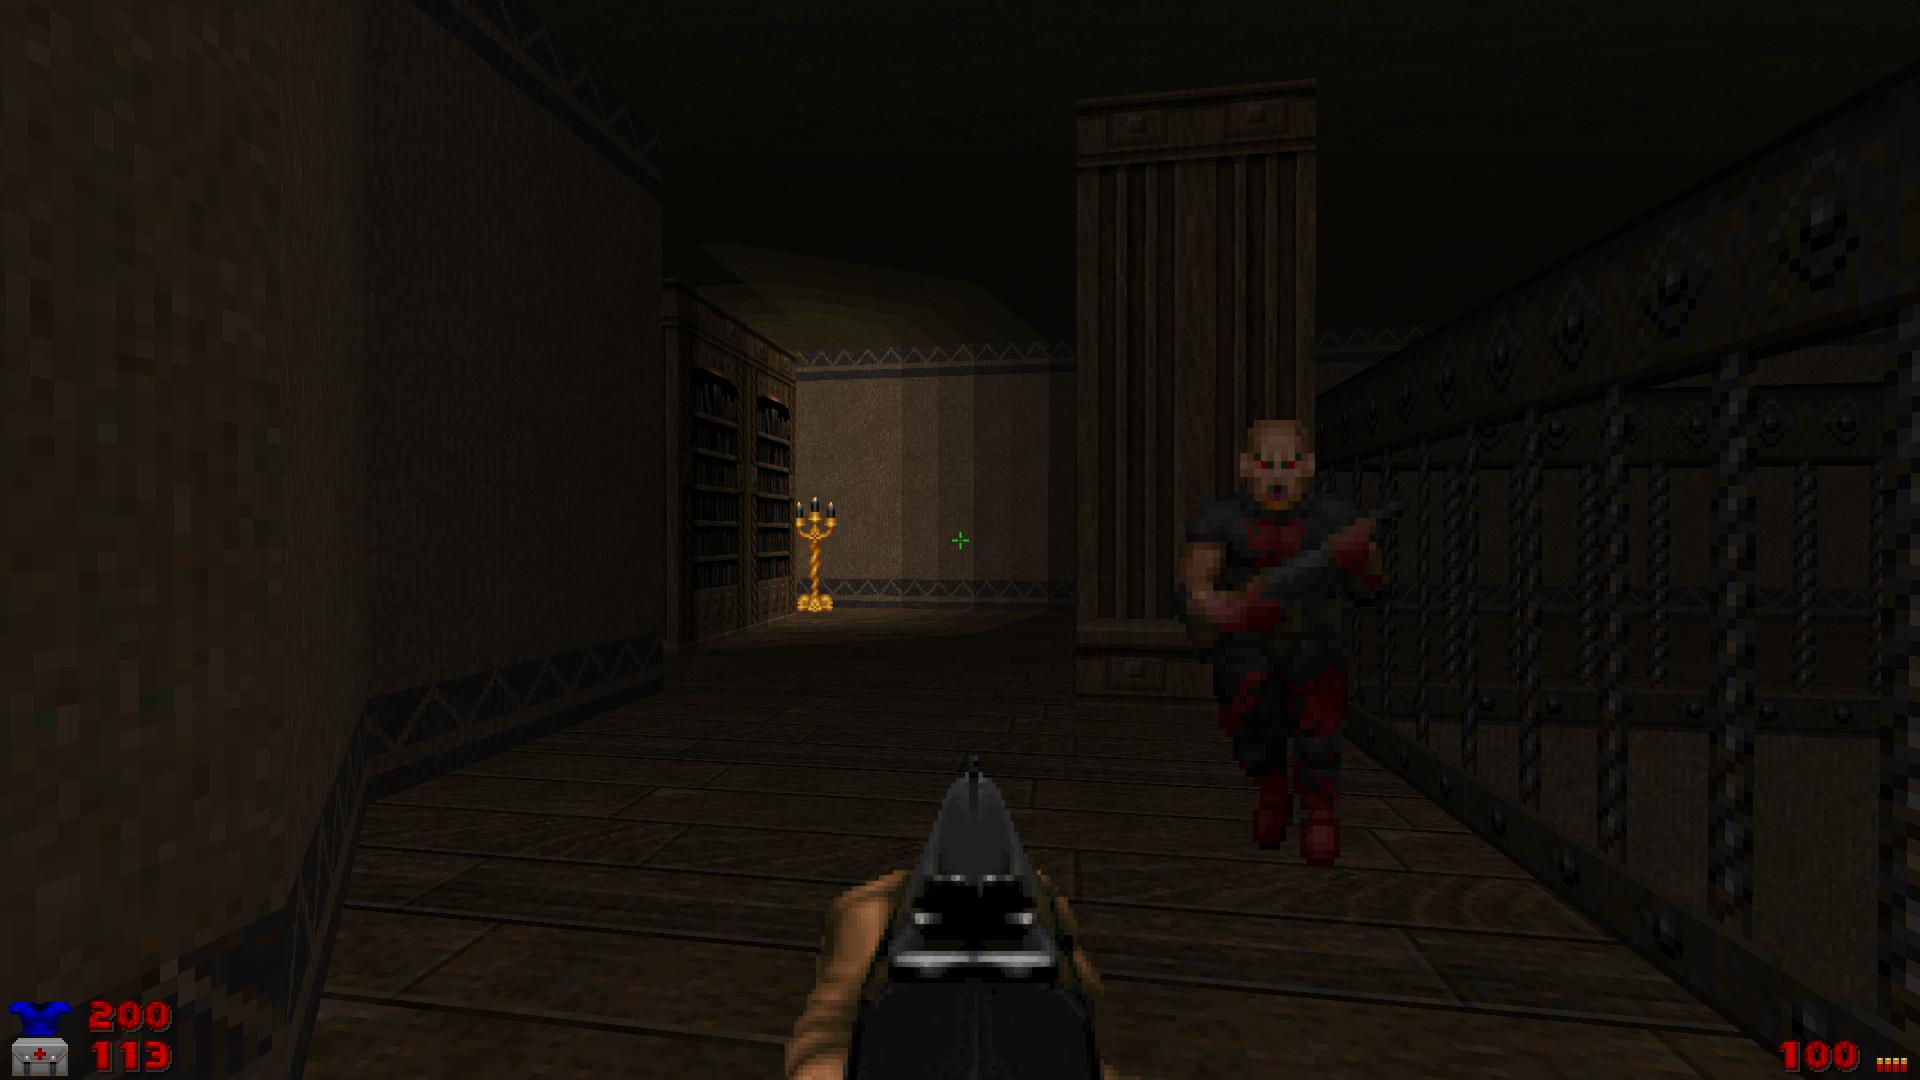 Screenshot_Doom_20210601_081514.png.1a1174e5fb5dbb9cab0a015e1f327d73.png